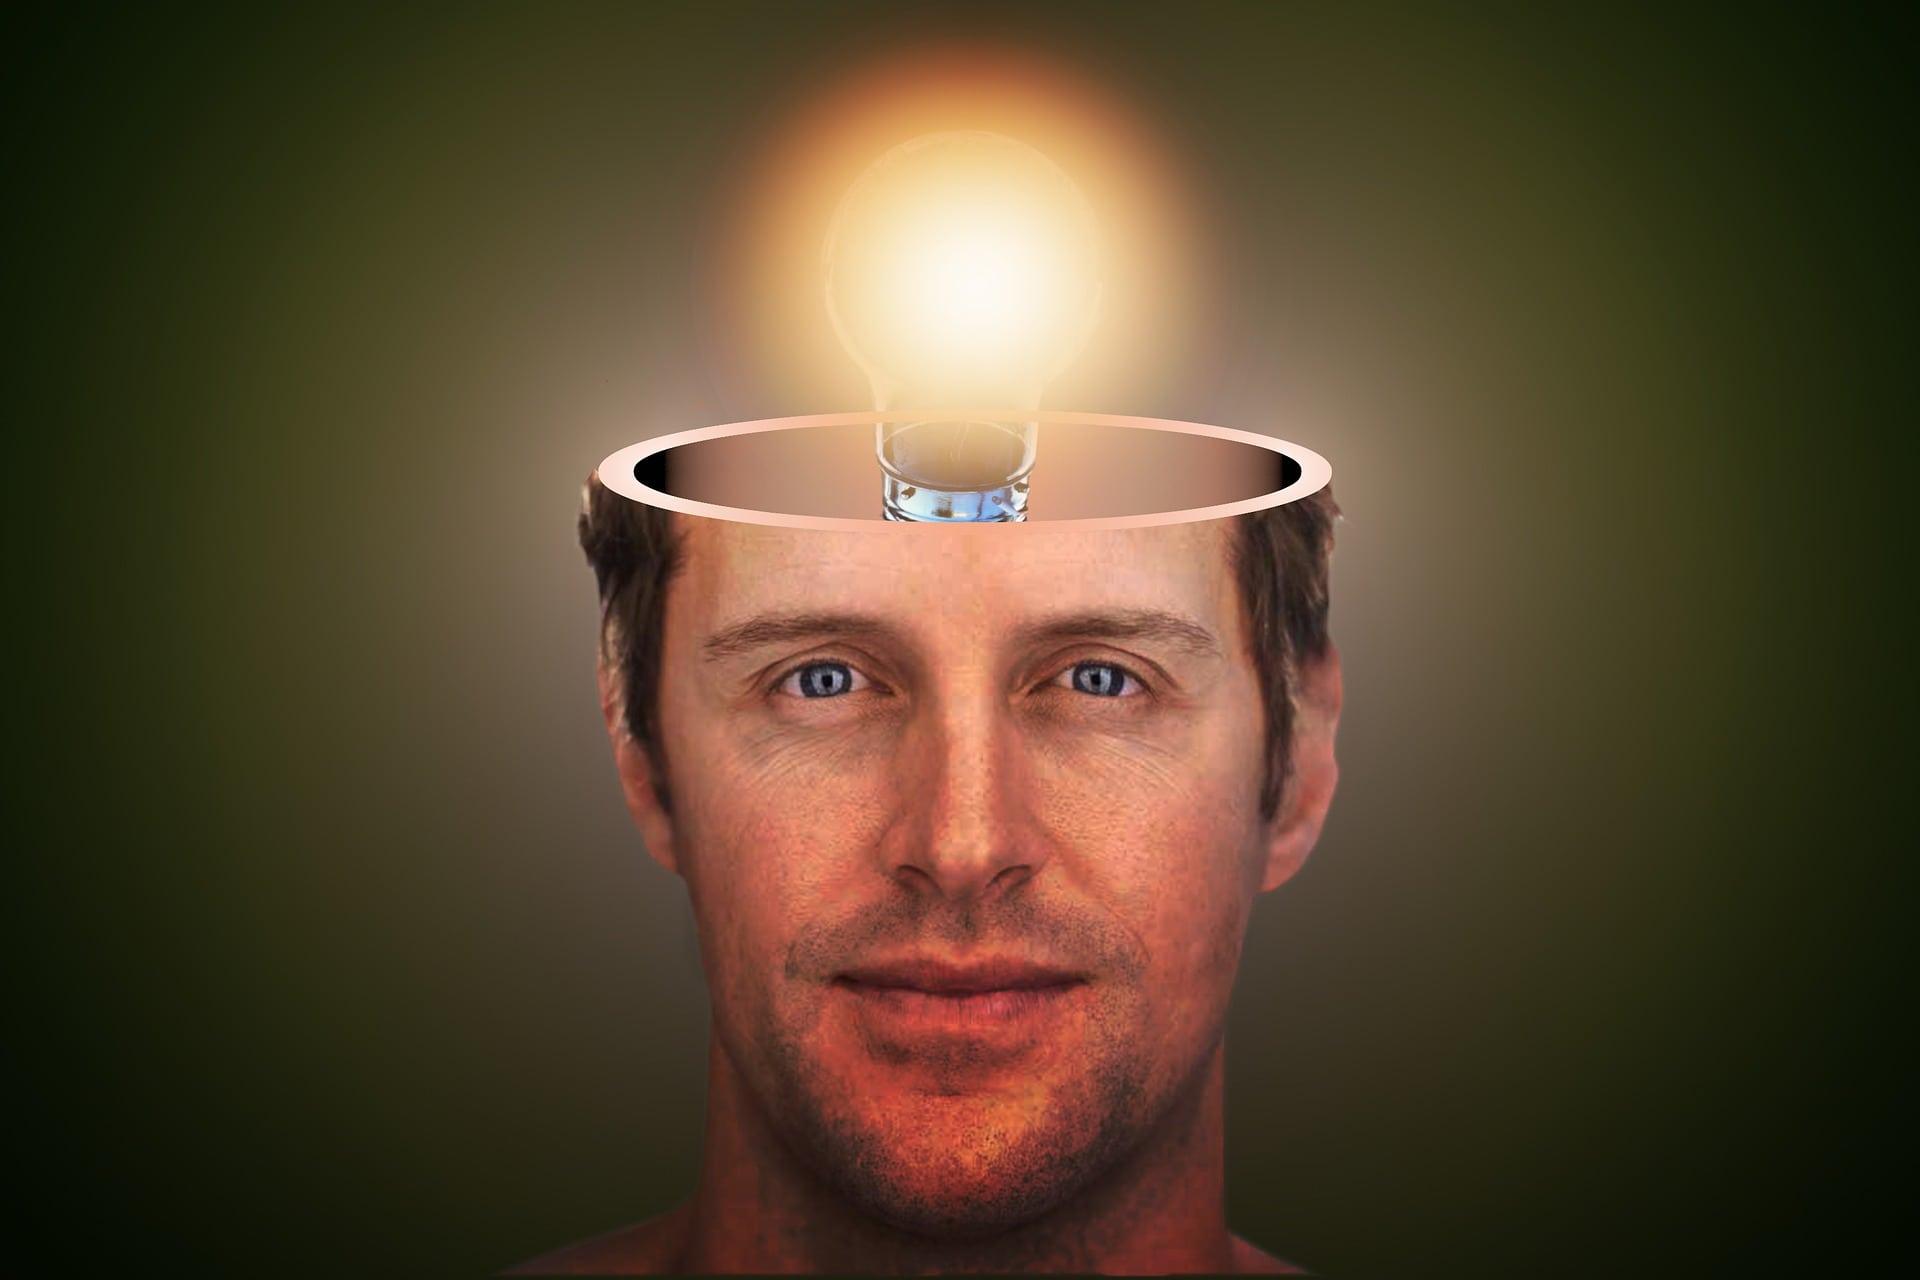 brainwave entrainment for ADHD